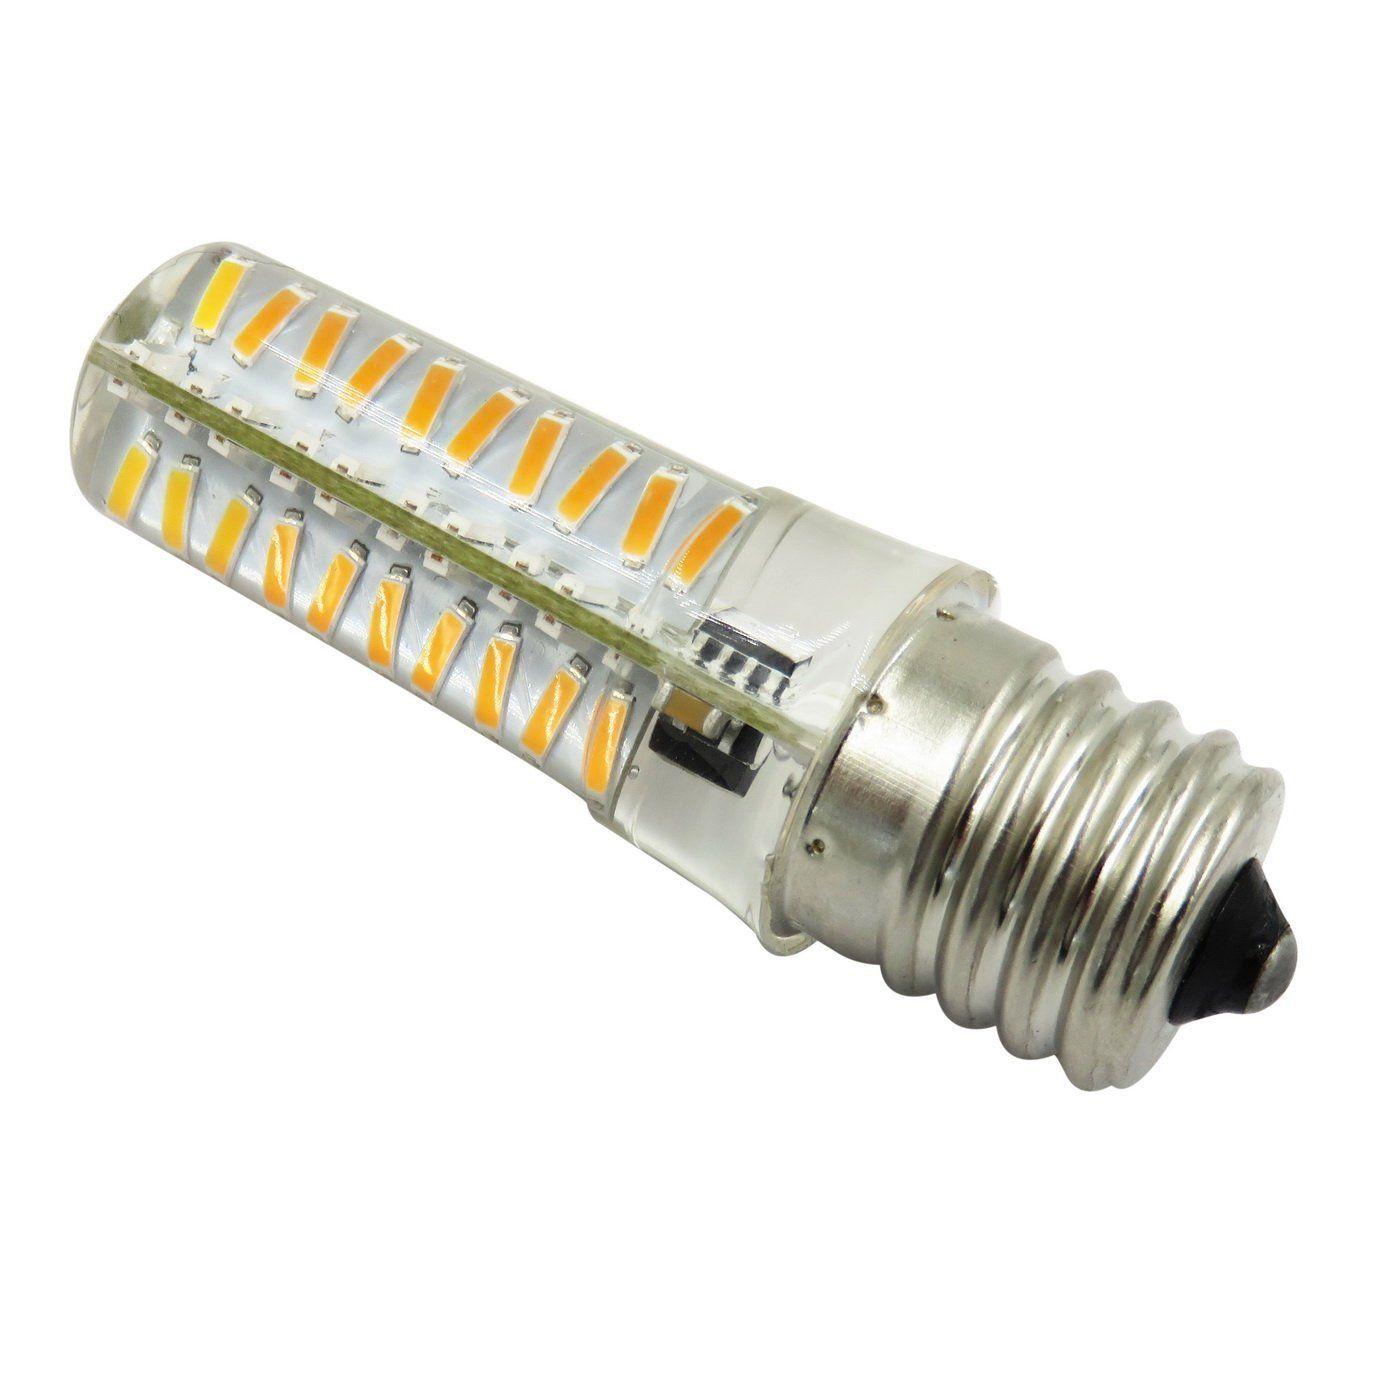 E17 LED Bulb Dimmable 110V/220V 5W 460 Lumens Transparent Microwave Oven Refrigerator Lamp Ceiling Fan Light Candelabra Bulb (pack of 10)